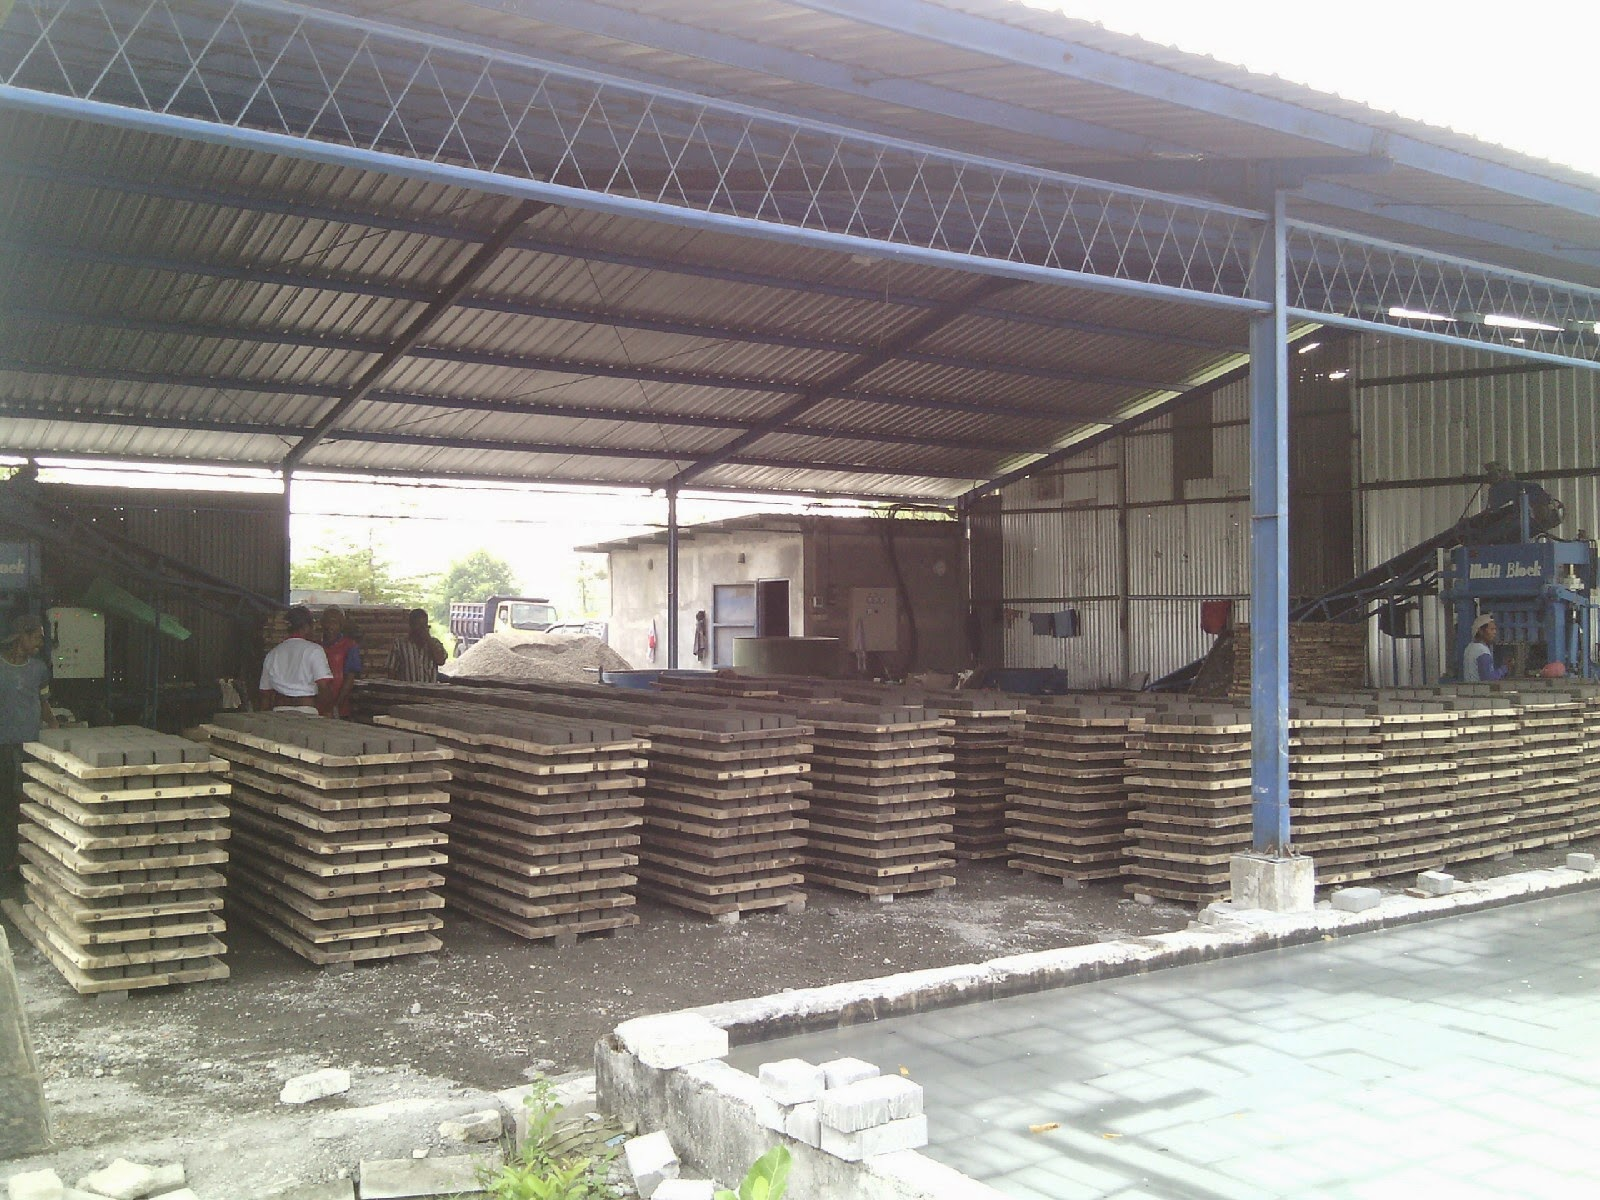 jual paving block di surabaya